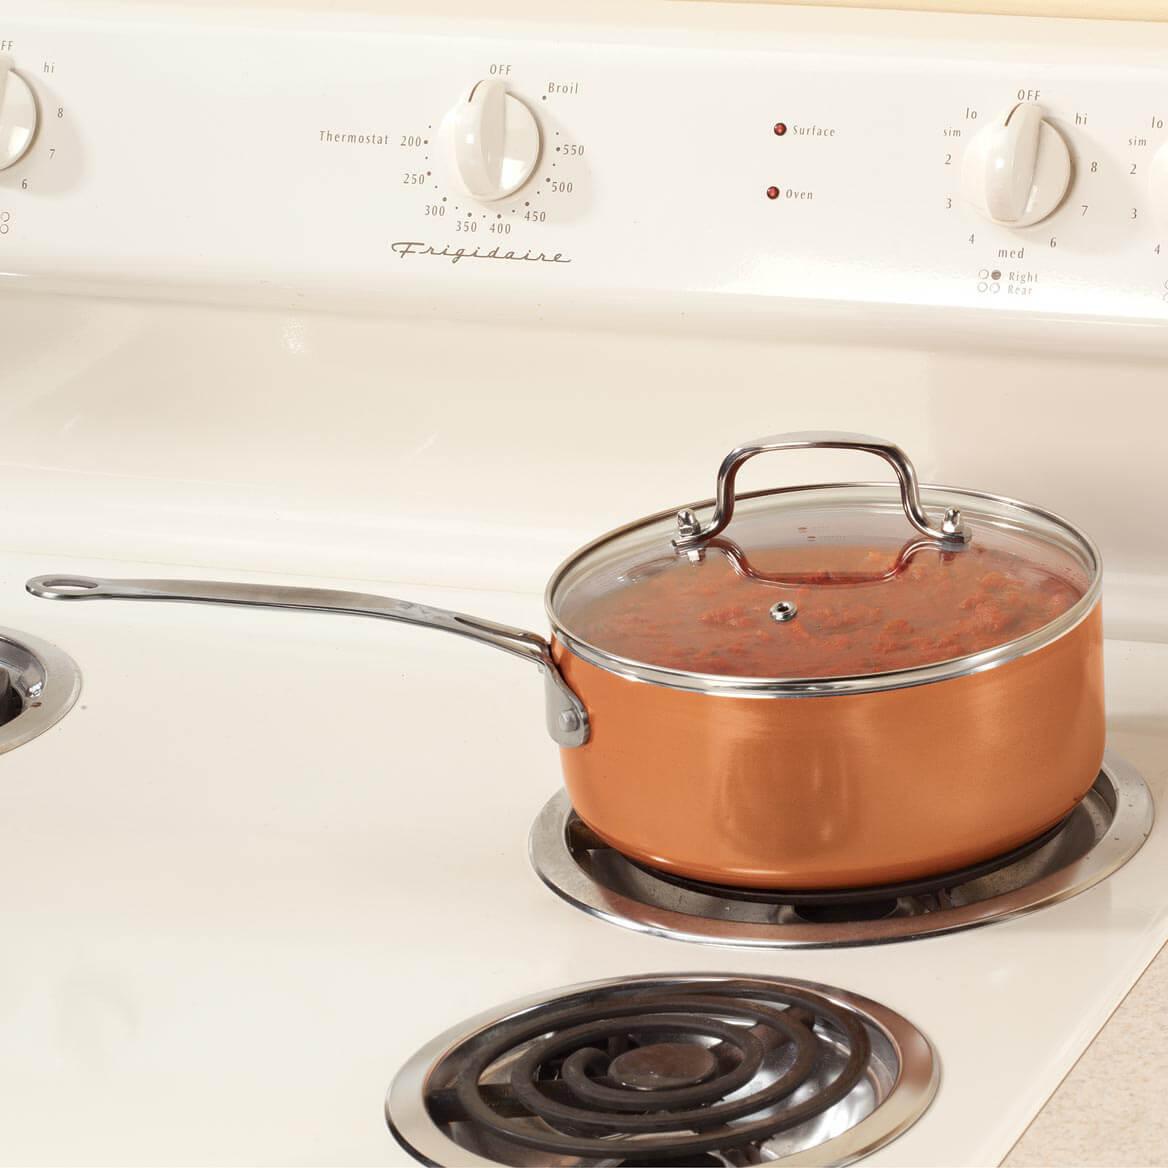 Ceramic Non-Stick Sauce Pan with Lid, 3 Qt-357616